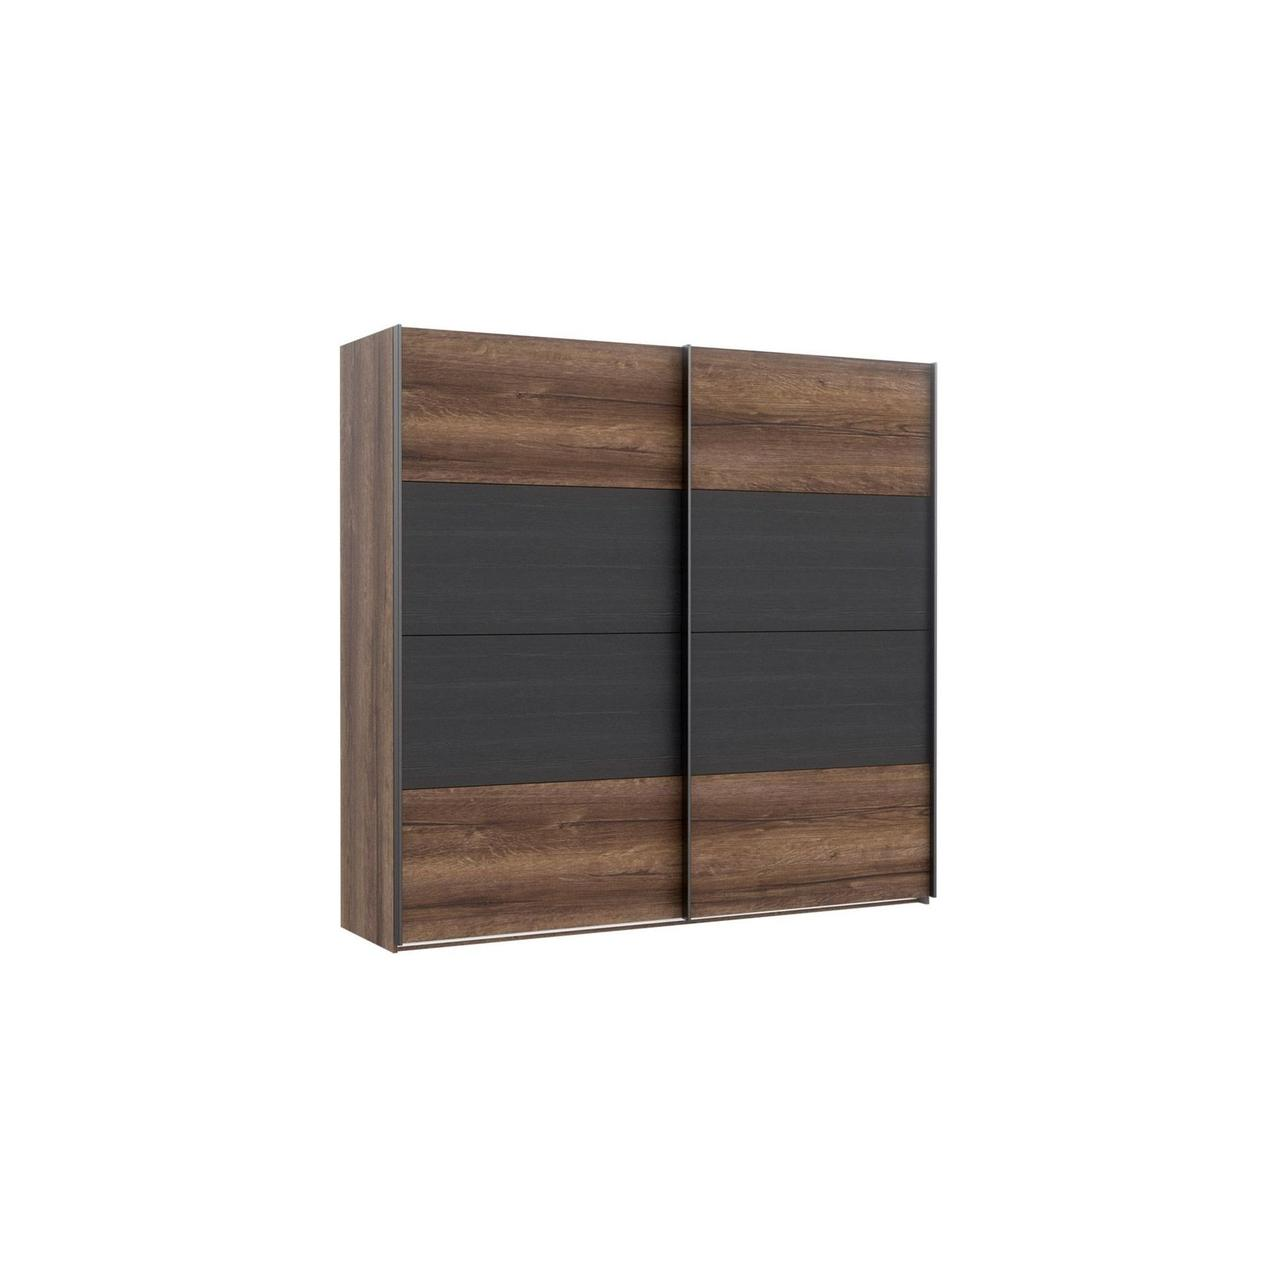 Шкаф RMRS324E1-N09 DREAMER Forte дуб благородный/черный